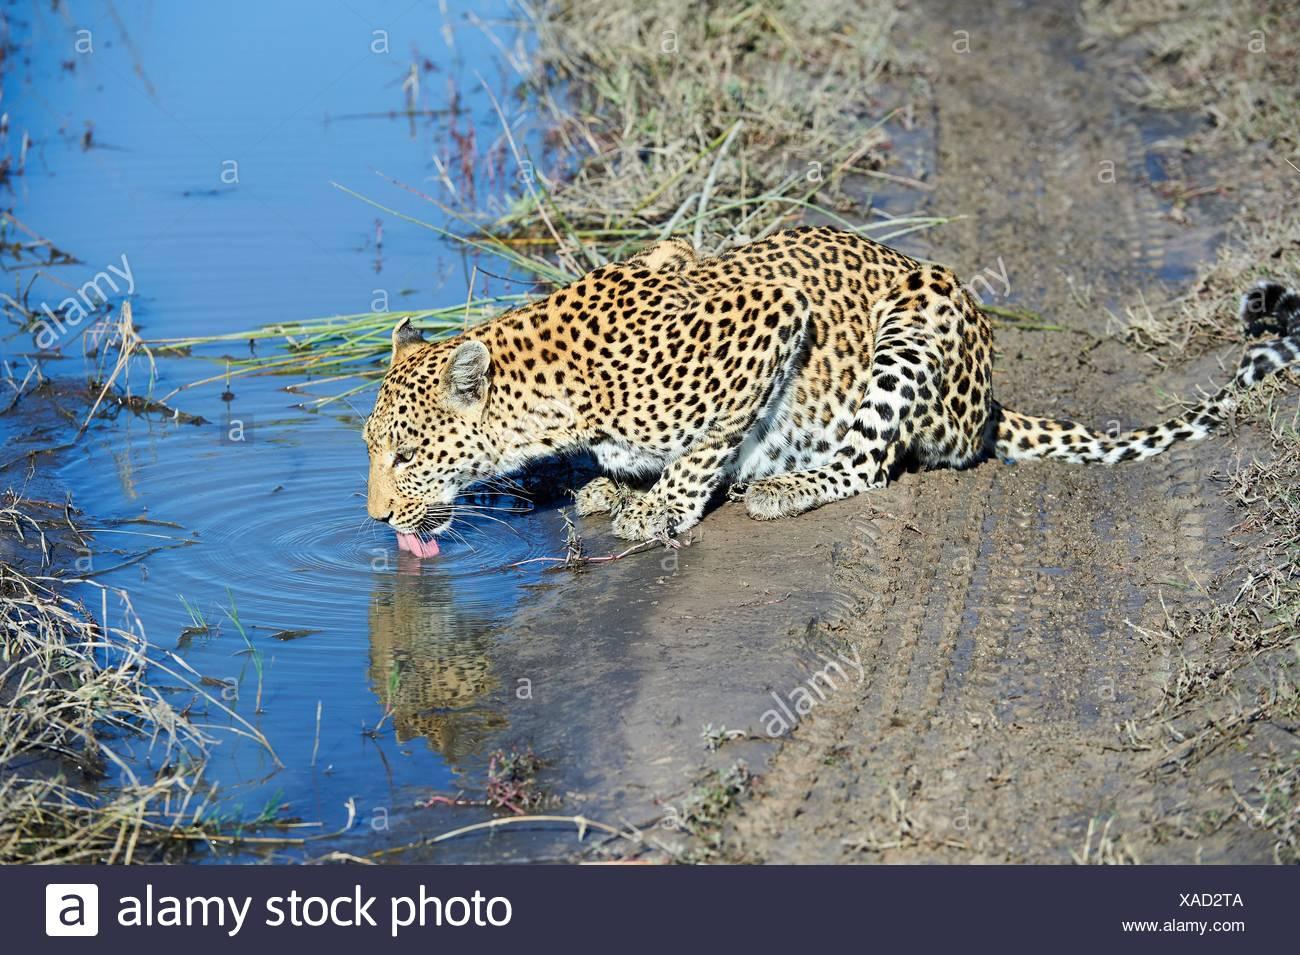 African leopard female (Panthera pardus) drinking. Moremi National Park, Okavango delta, Botswana, Southern Africa. - Stock Image